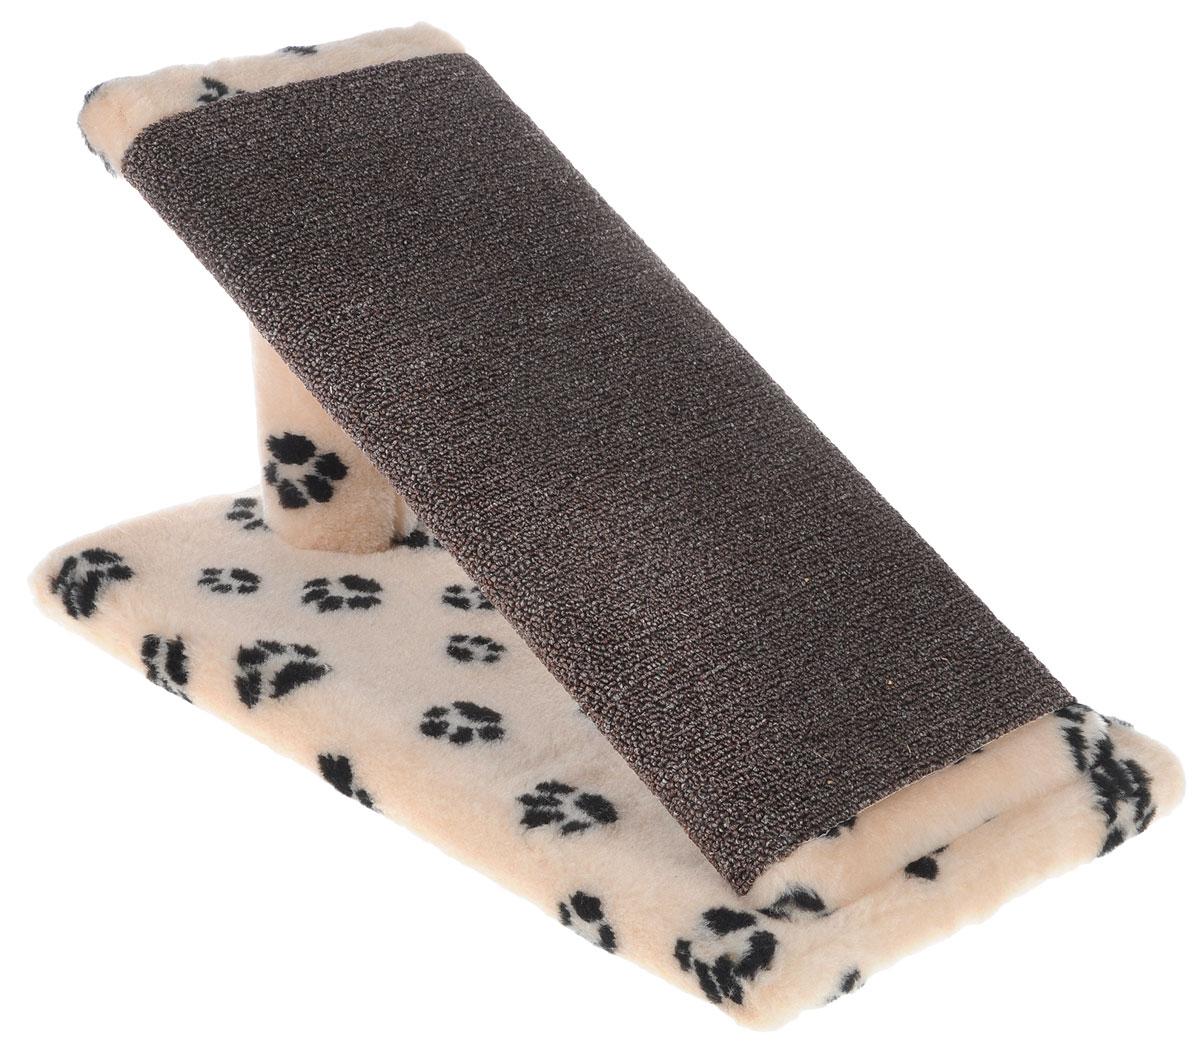 Меридиан, Когтеточка для котят Горка, ковролин, рис.Лапки (бежевый фон, черный рисунок), 45 х 25 х 25 см цена